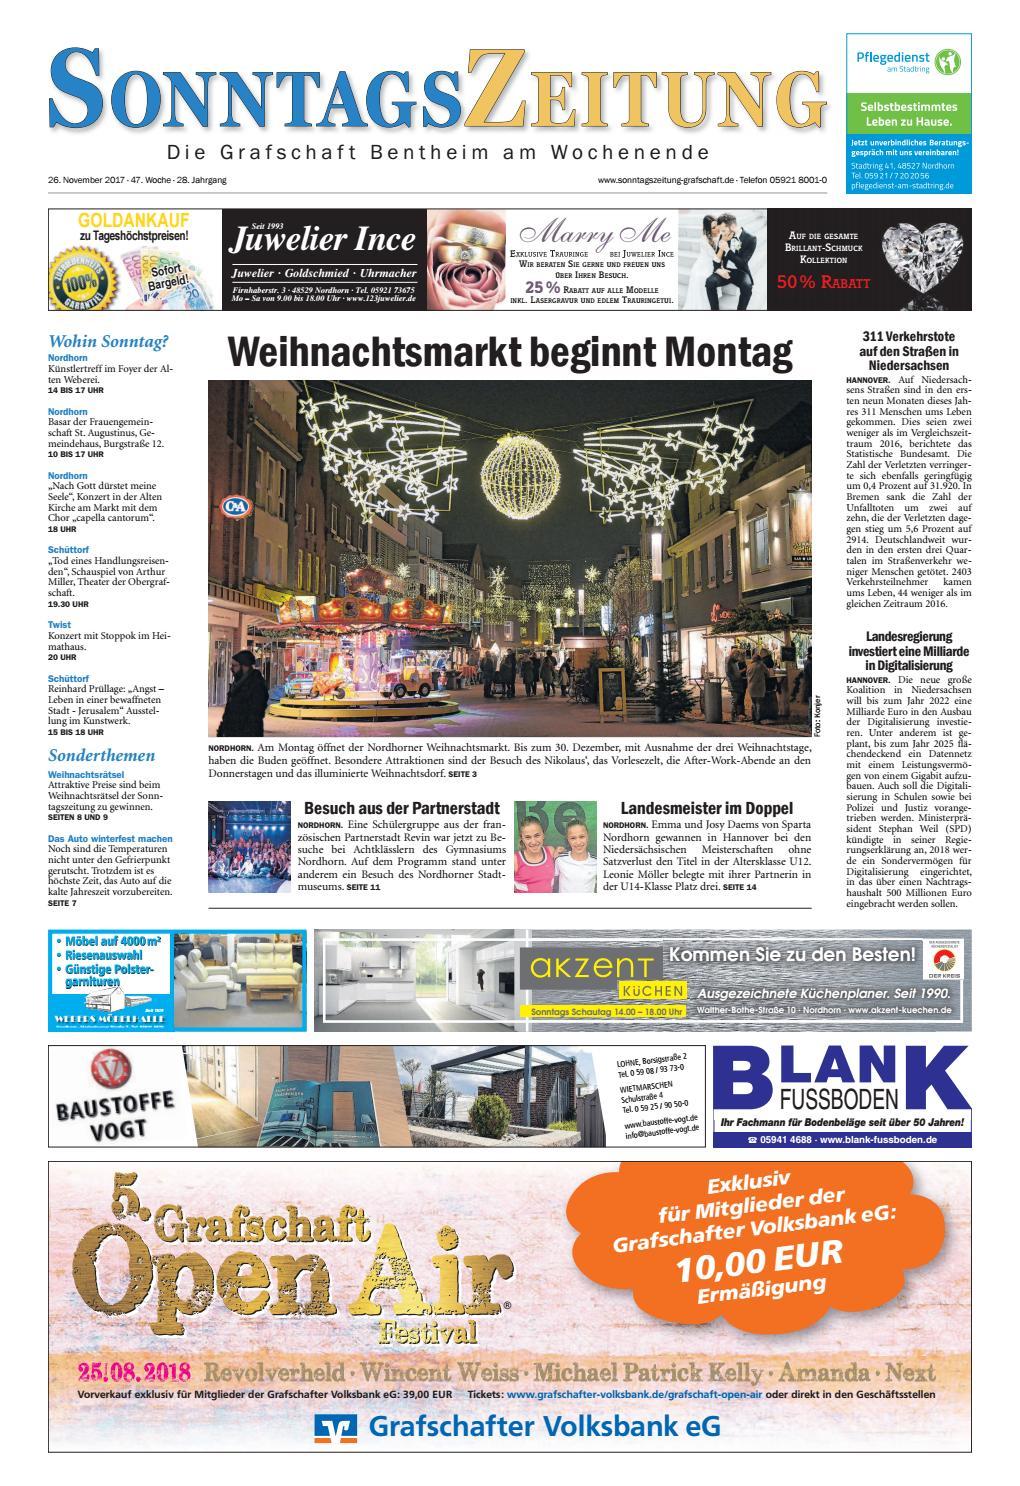 SonntagsZeitung_26-11-2017 by SonntagsZeitung - issuu